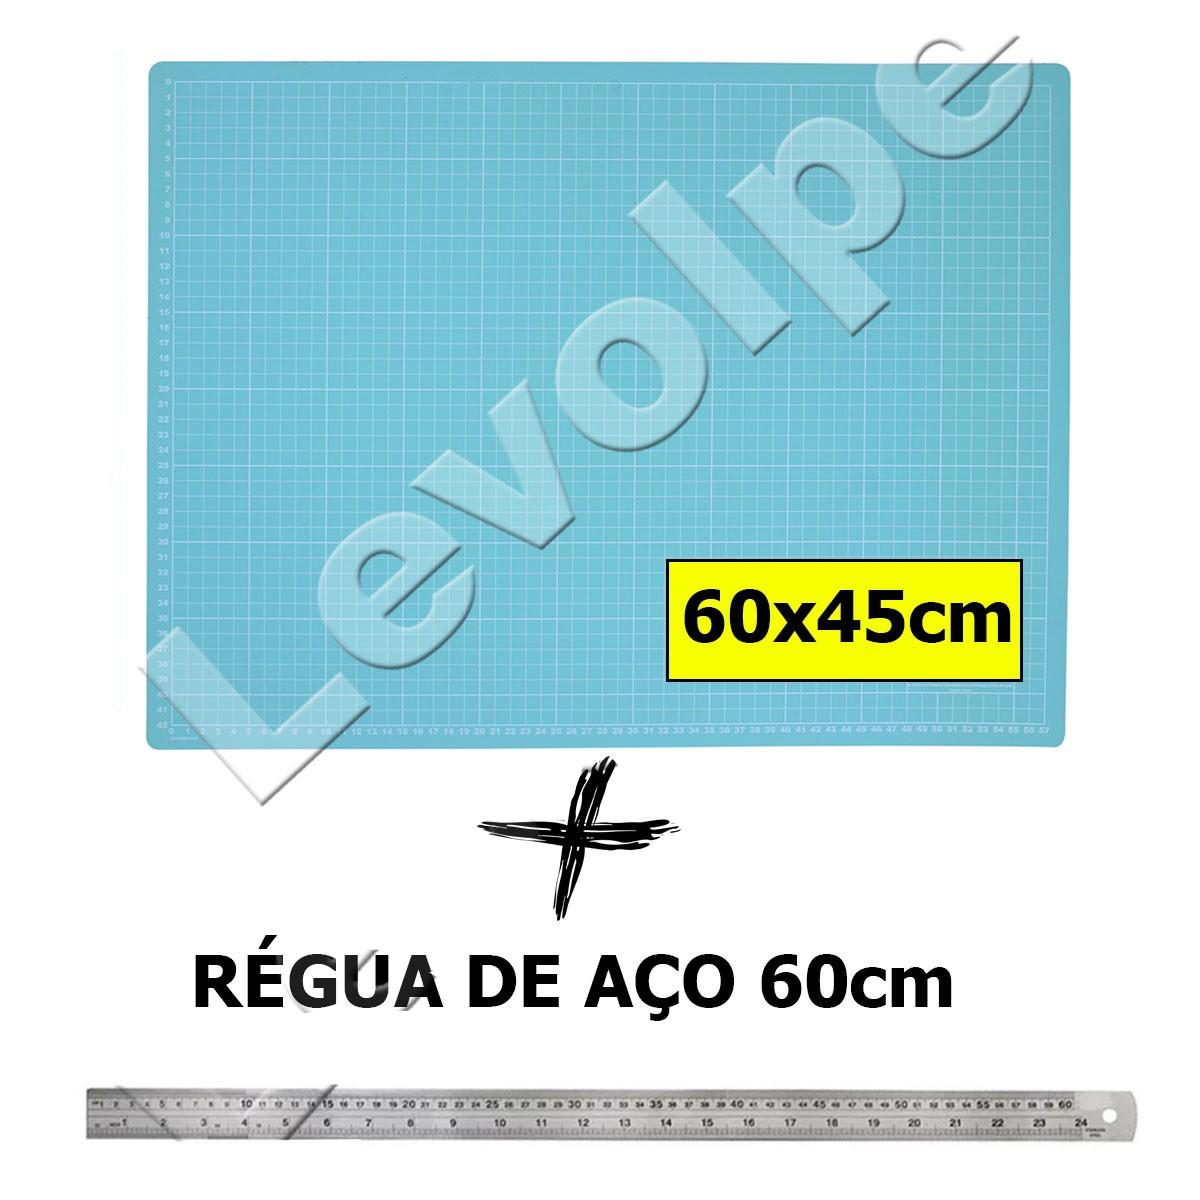 Kit Base De Corte A2 60x45 Azul Turquesa + Régua 60cm Aço